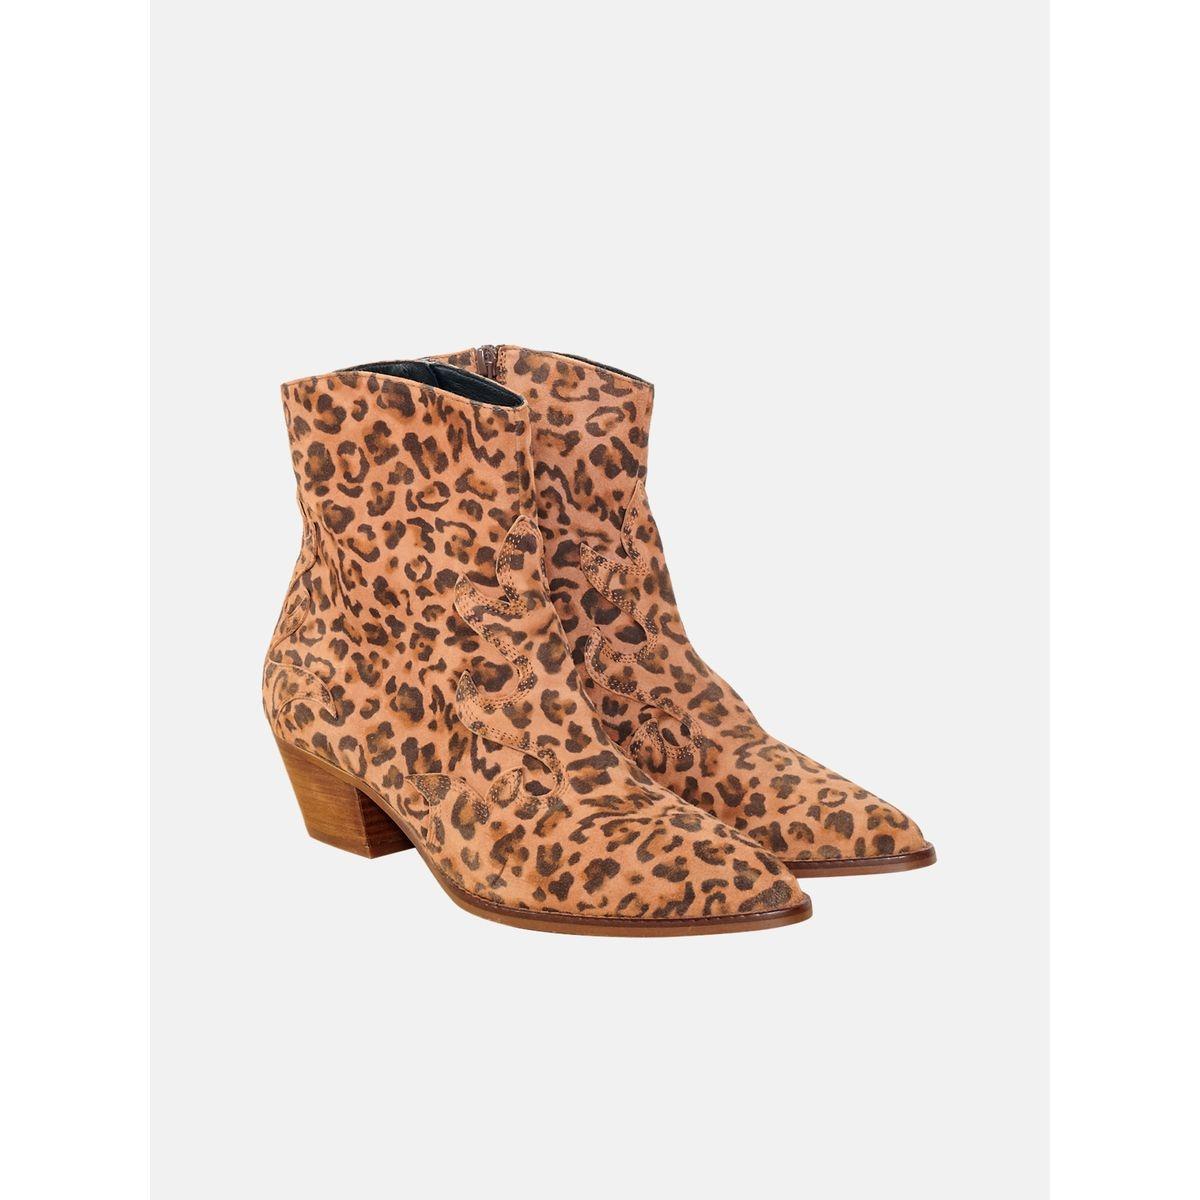 Boots en cuir NICO LEOPARD